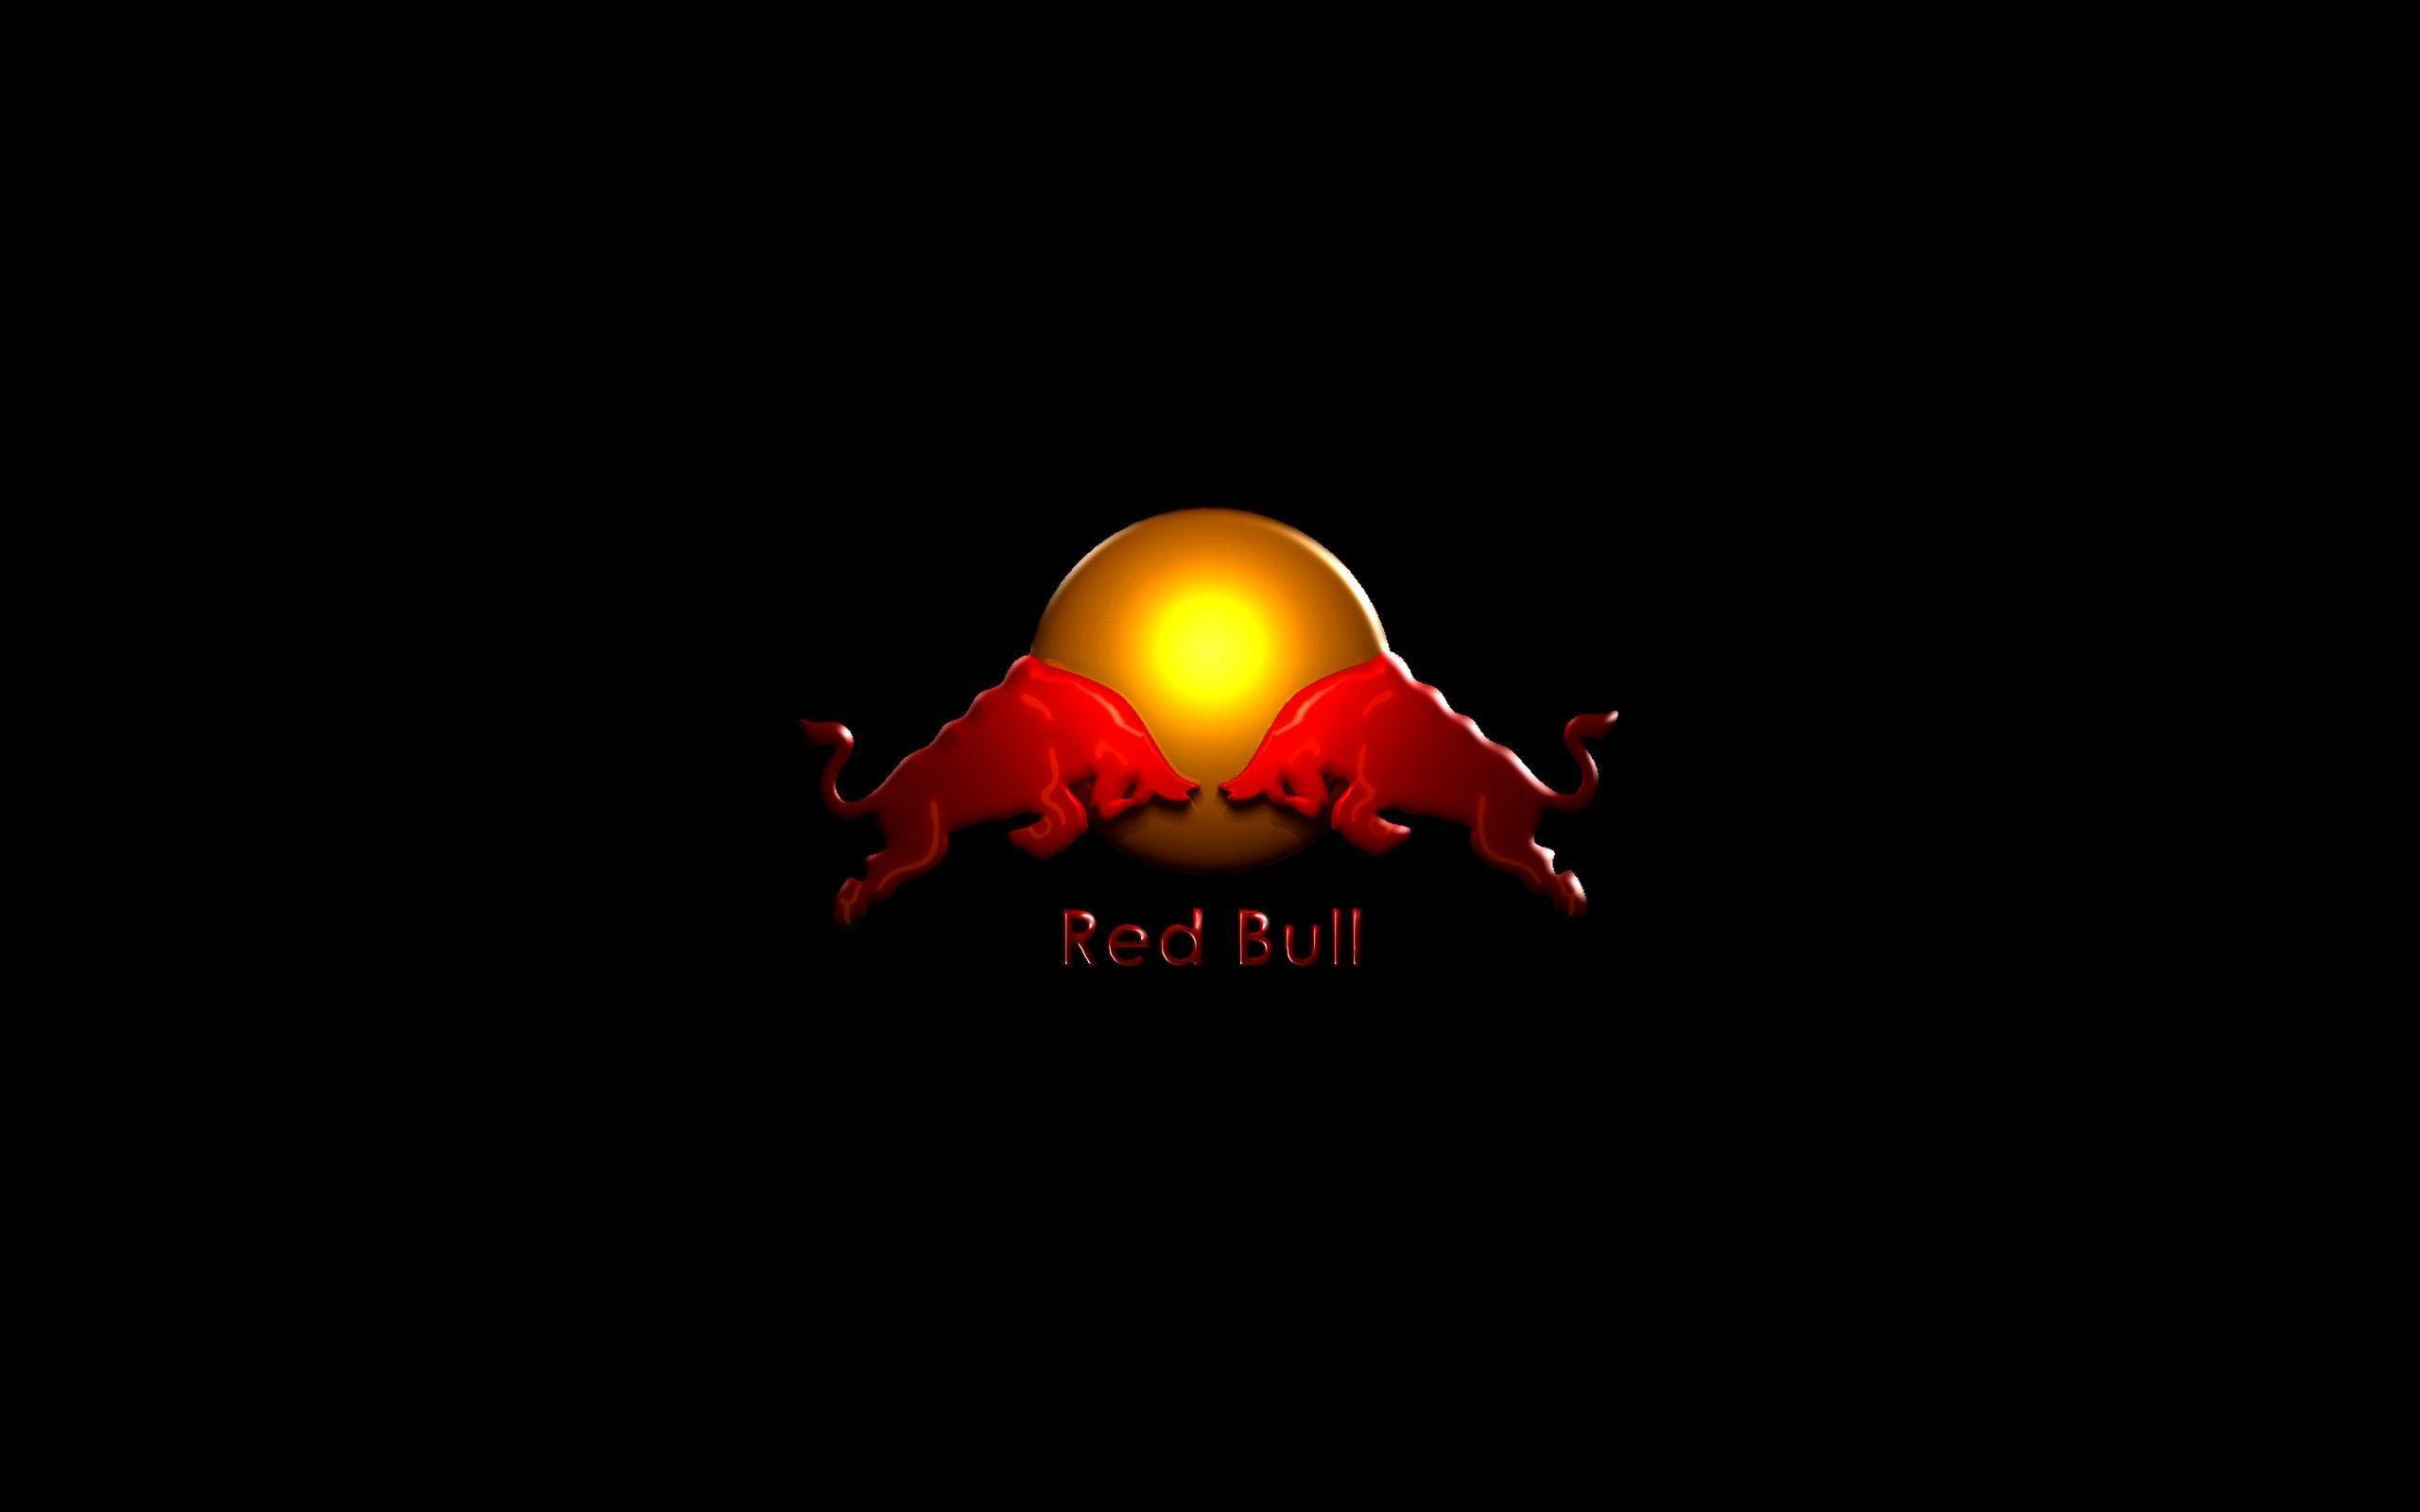 Red Bull Logo Wallpapers